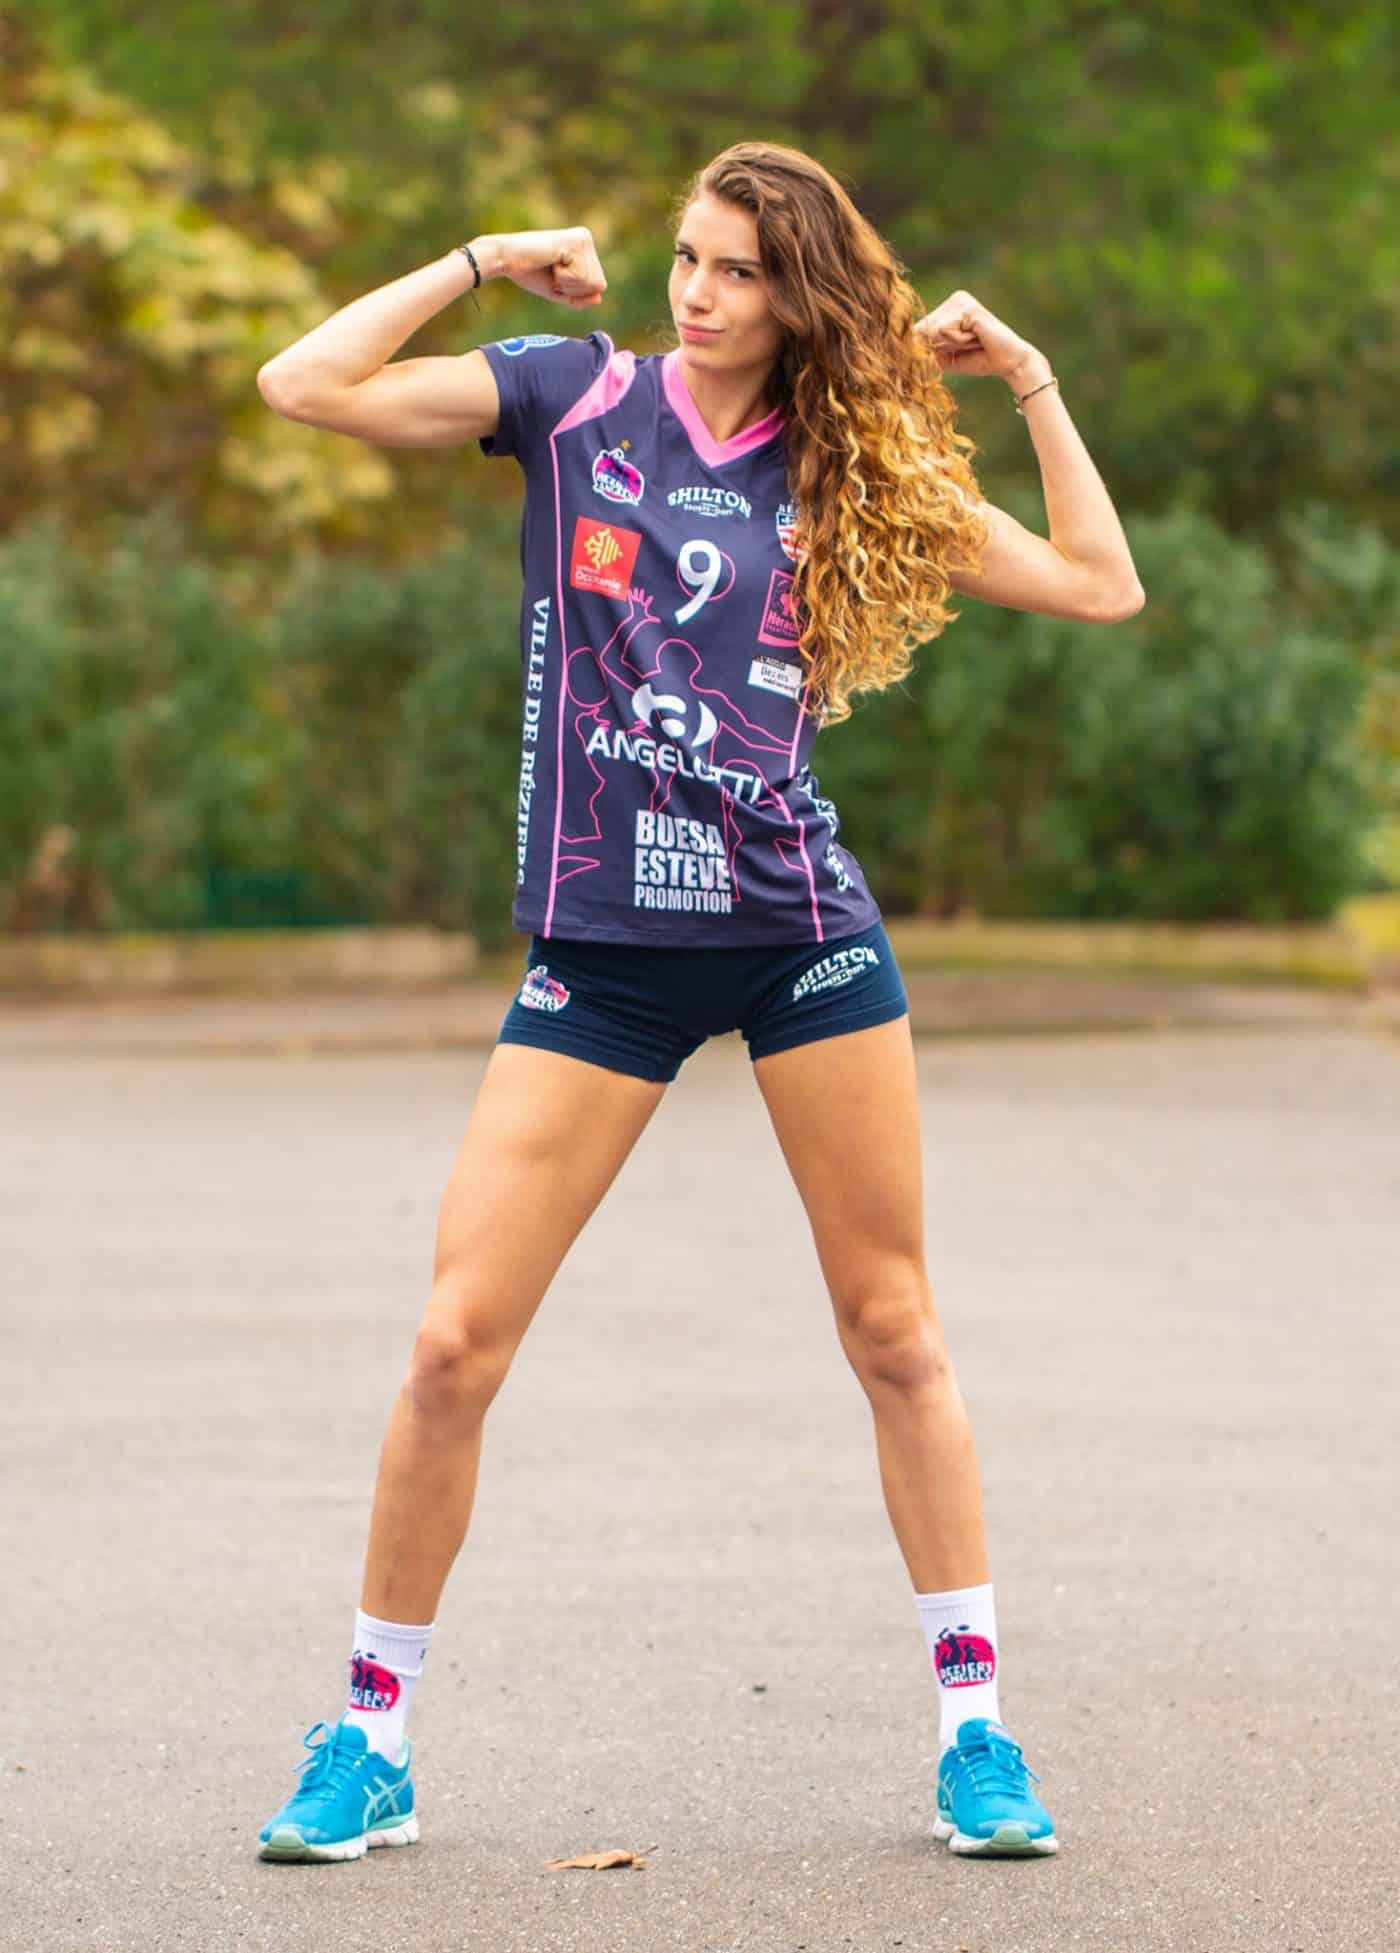 nouveau-maillot-volley-beziers-angels-shilton-2018-2019-laf-lnv-5